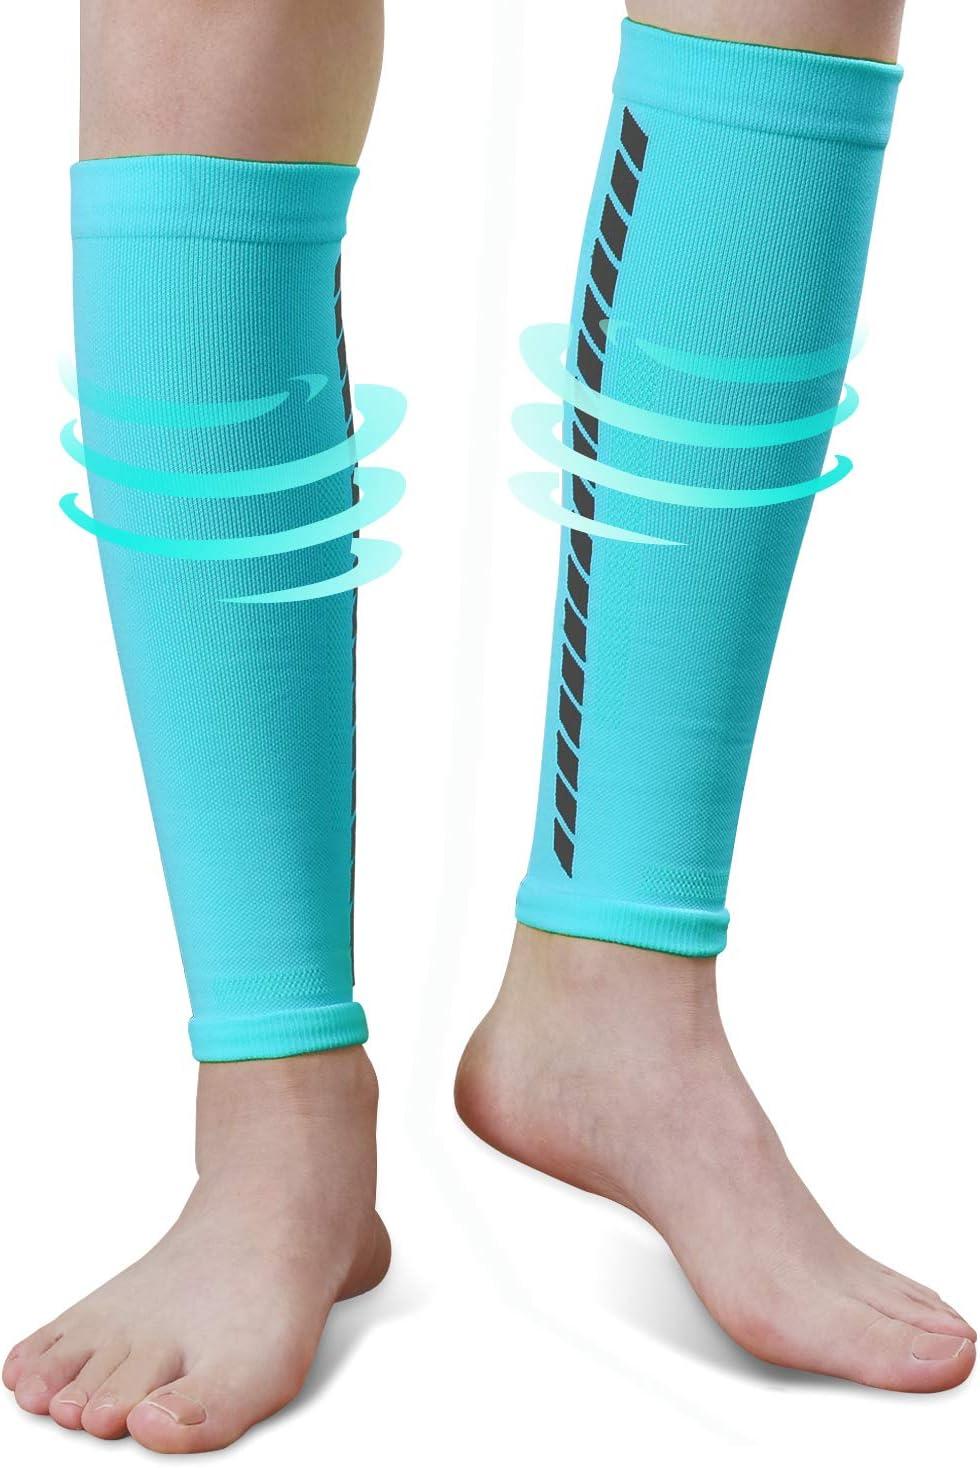 EXski Beinlinge Wadenbandage Waden Kompressionsstr/ümpfe Calf Sleeve Laufen Radfahren Marathon Triathlon Herren Damen